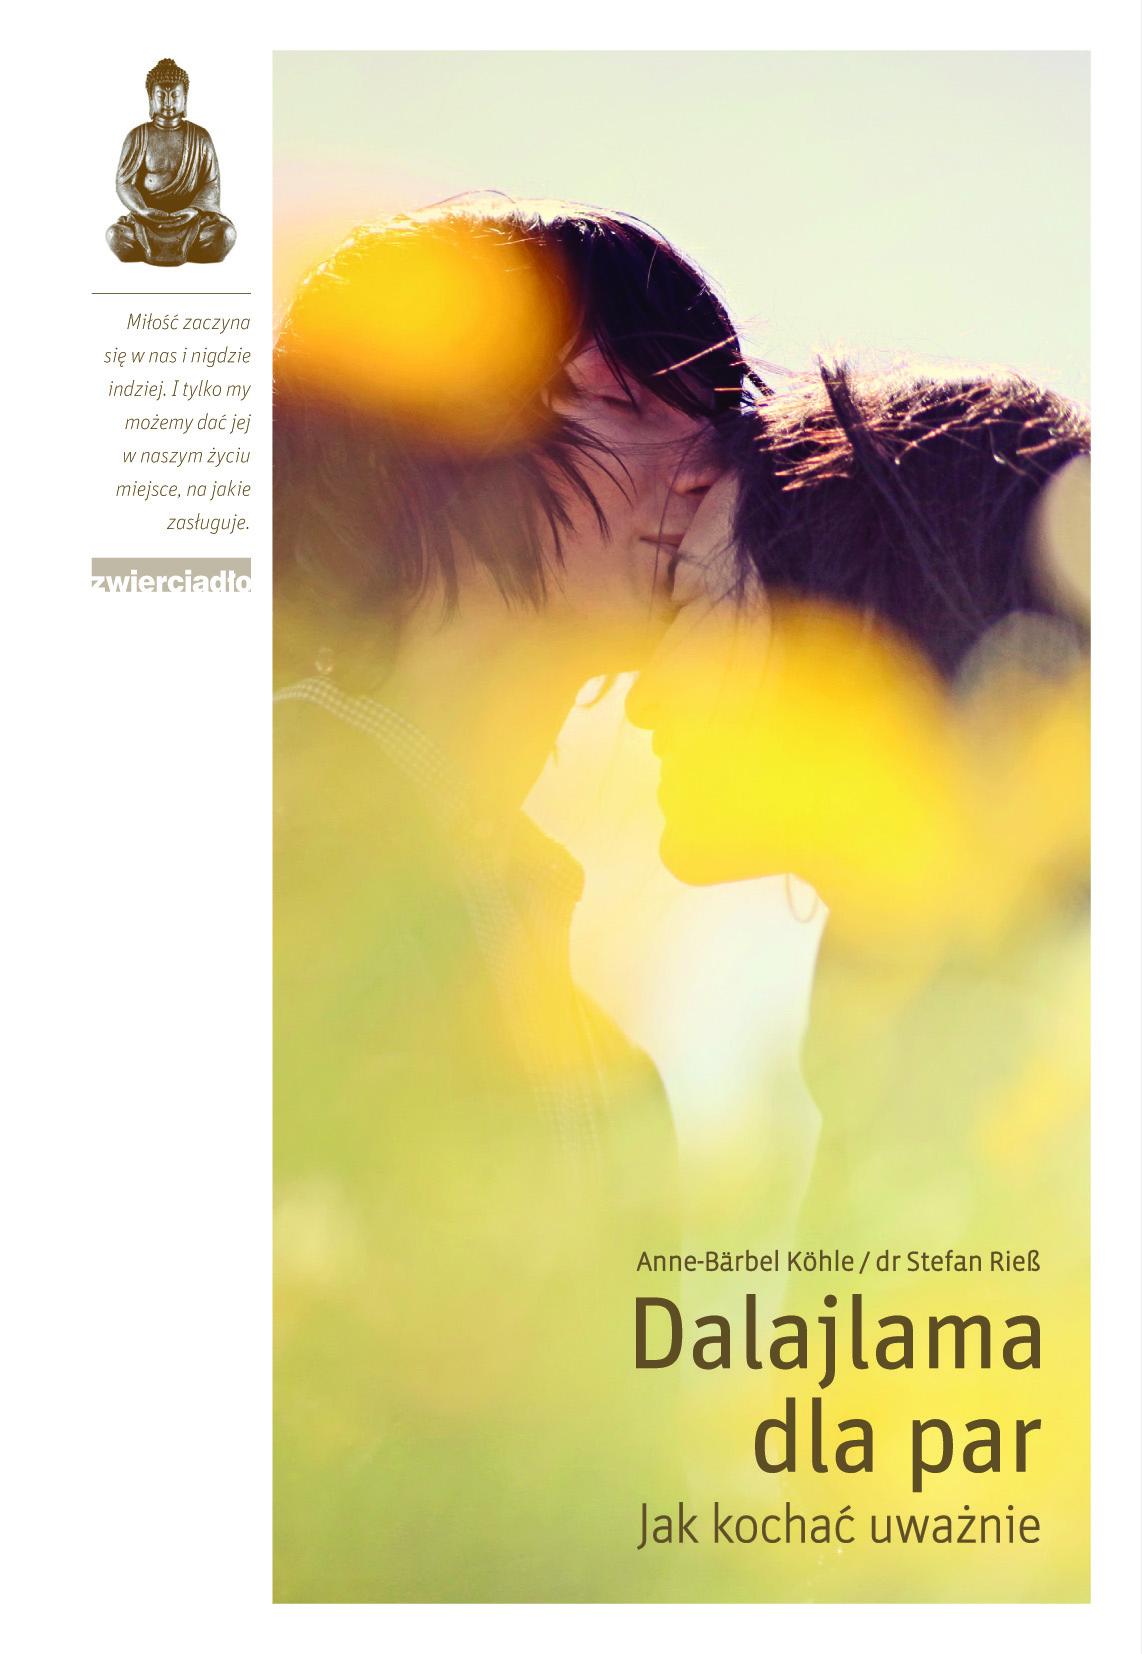 Dalajlama_dla_par_200_dpi